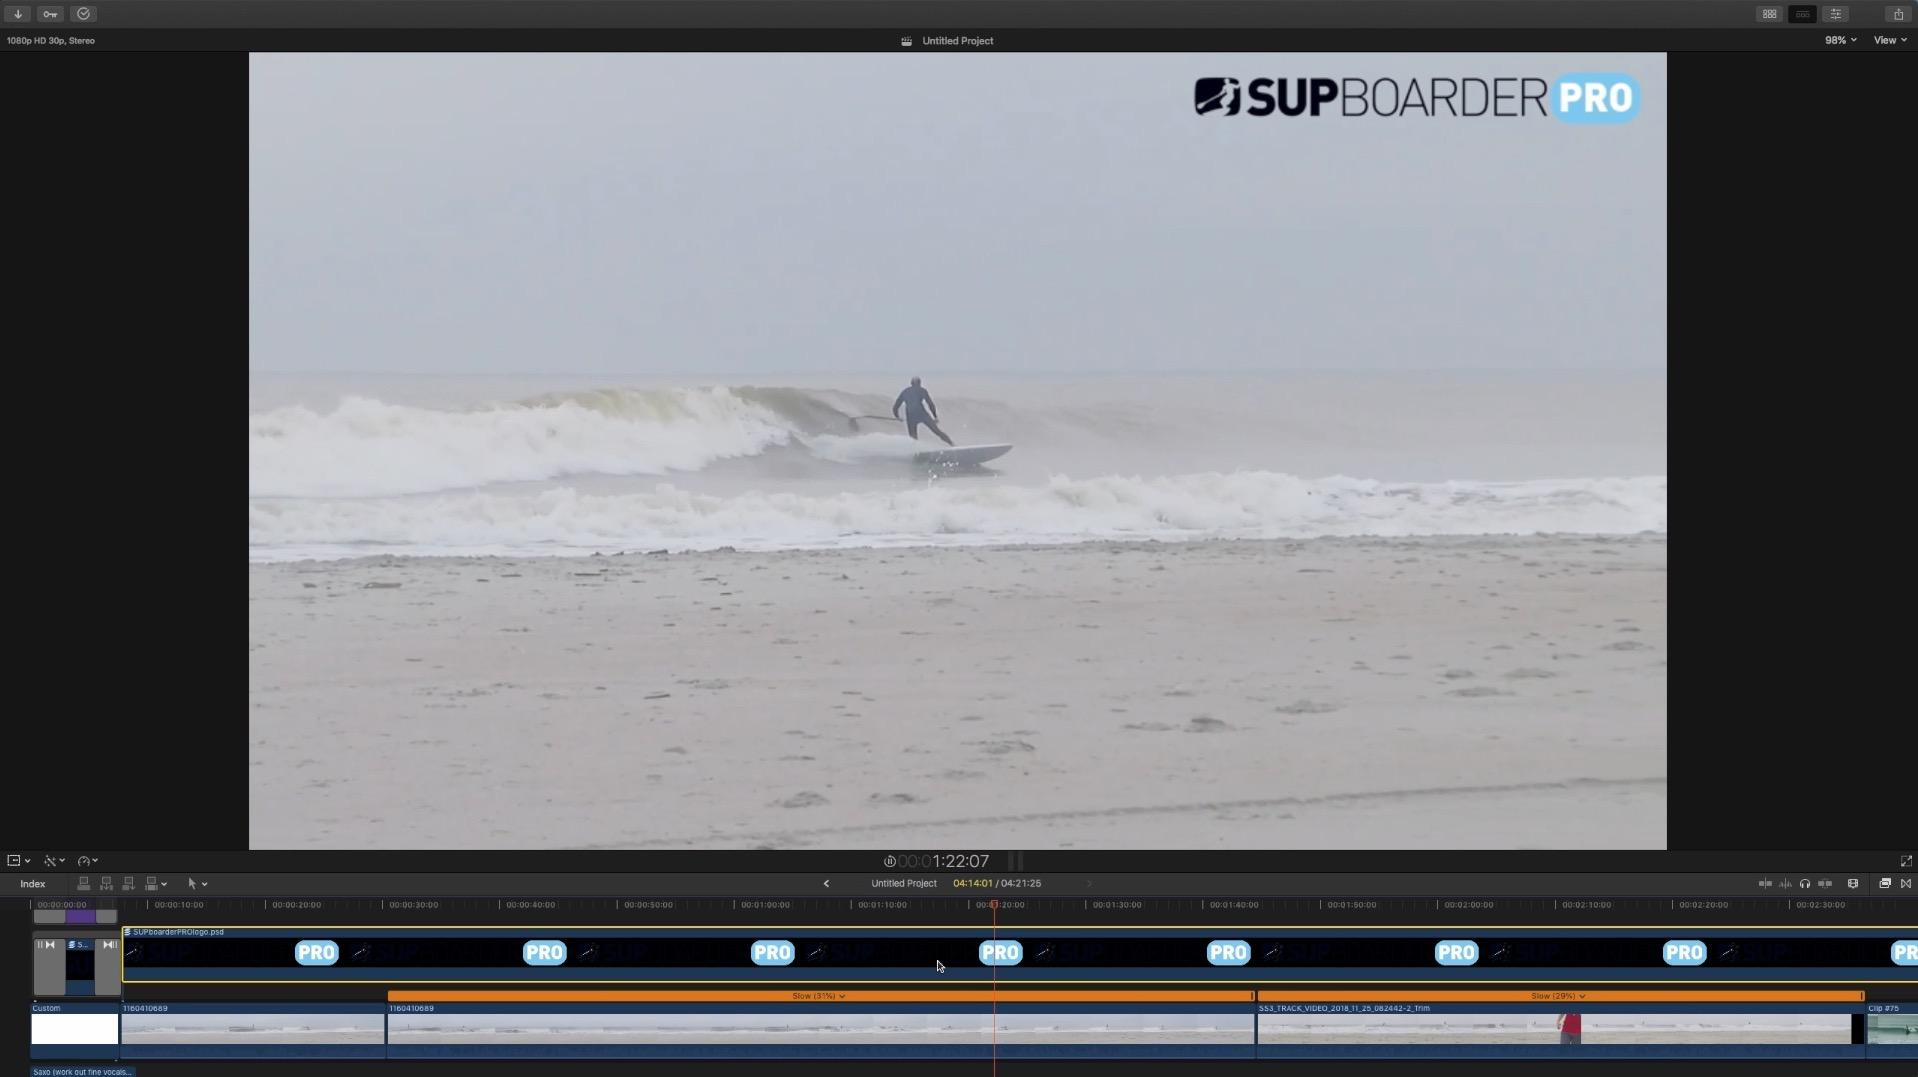 SUPboarder Pro